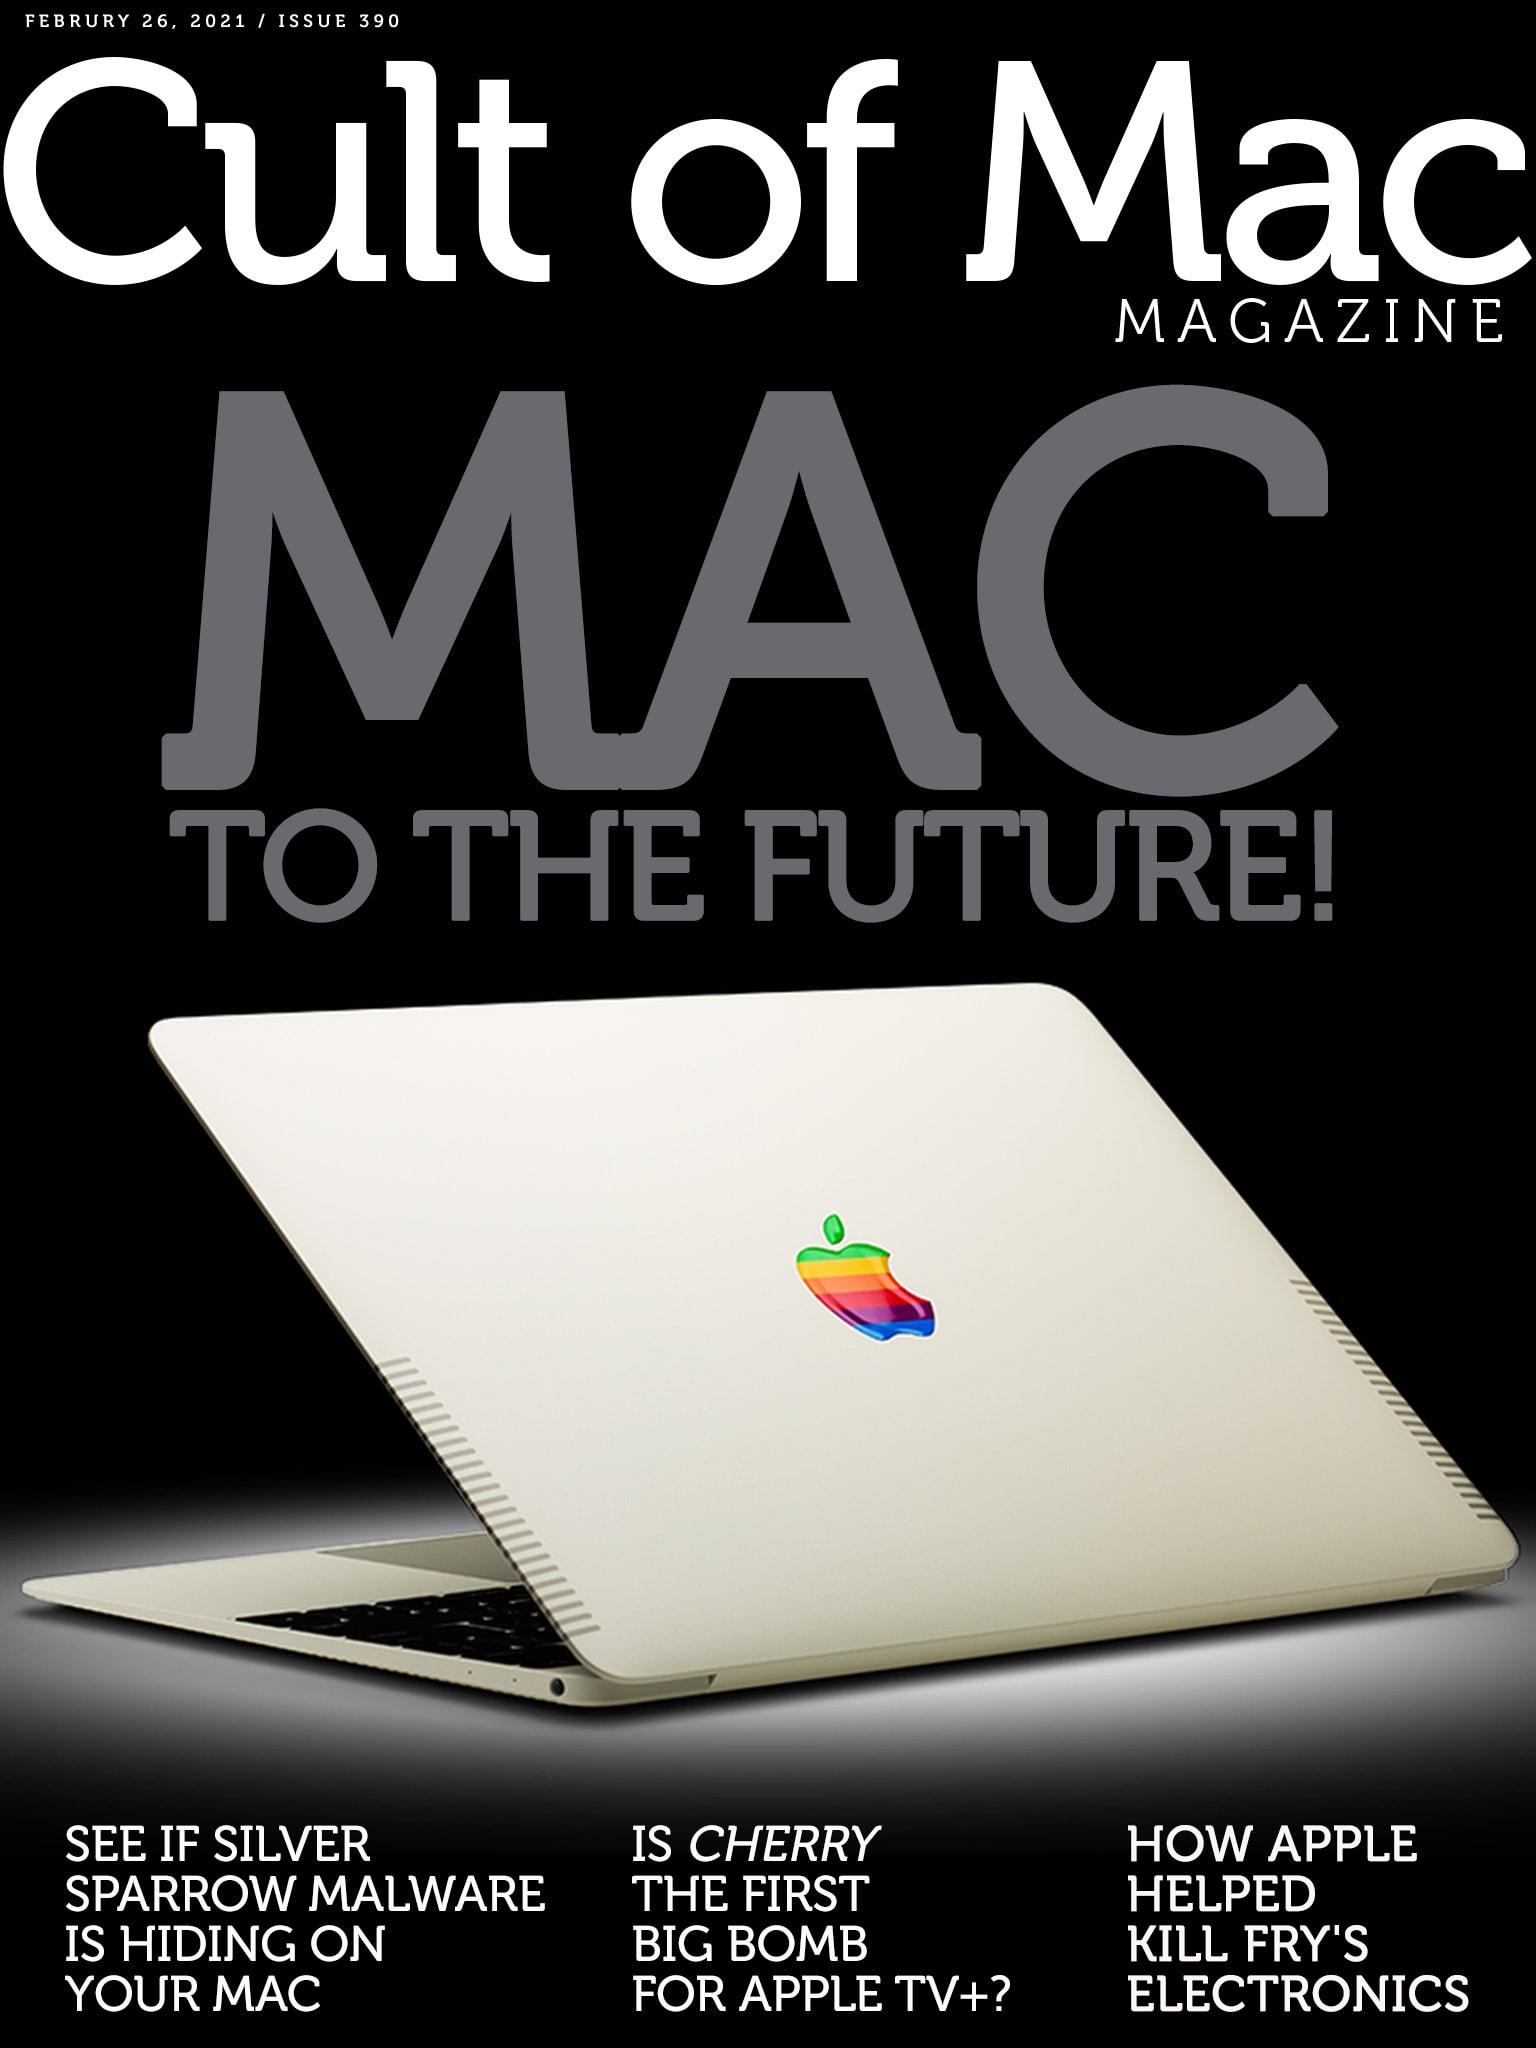 Mac to the future! [Cult of Mac Magazine 390]